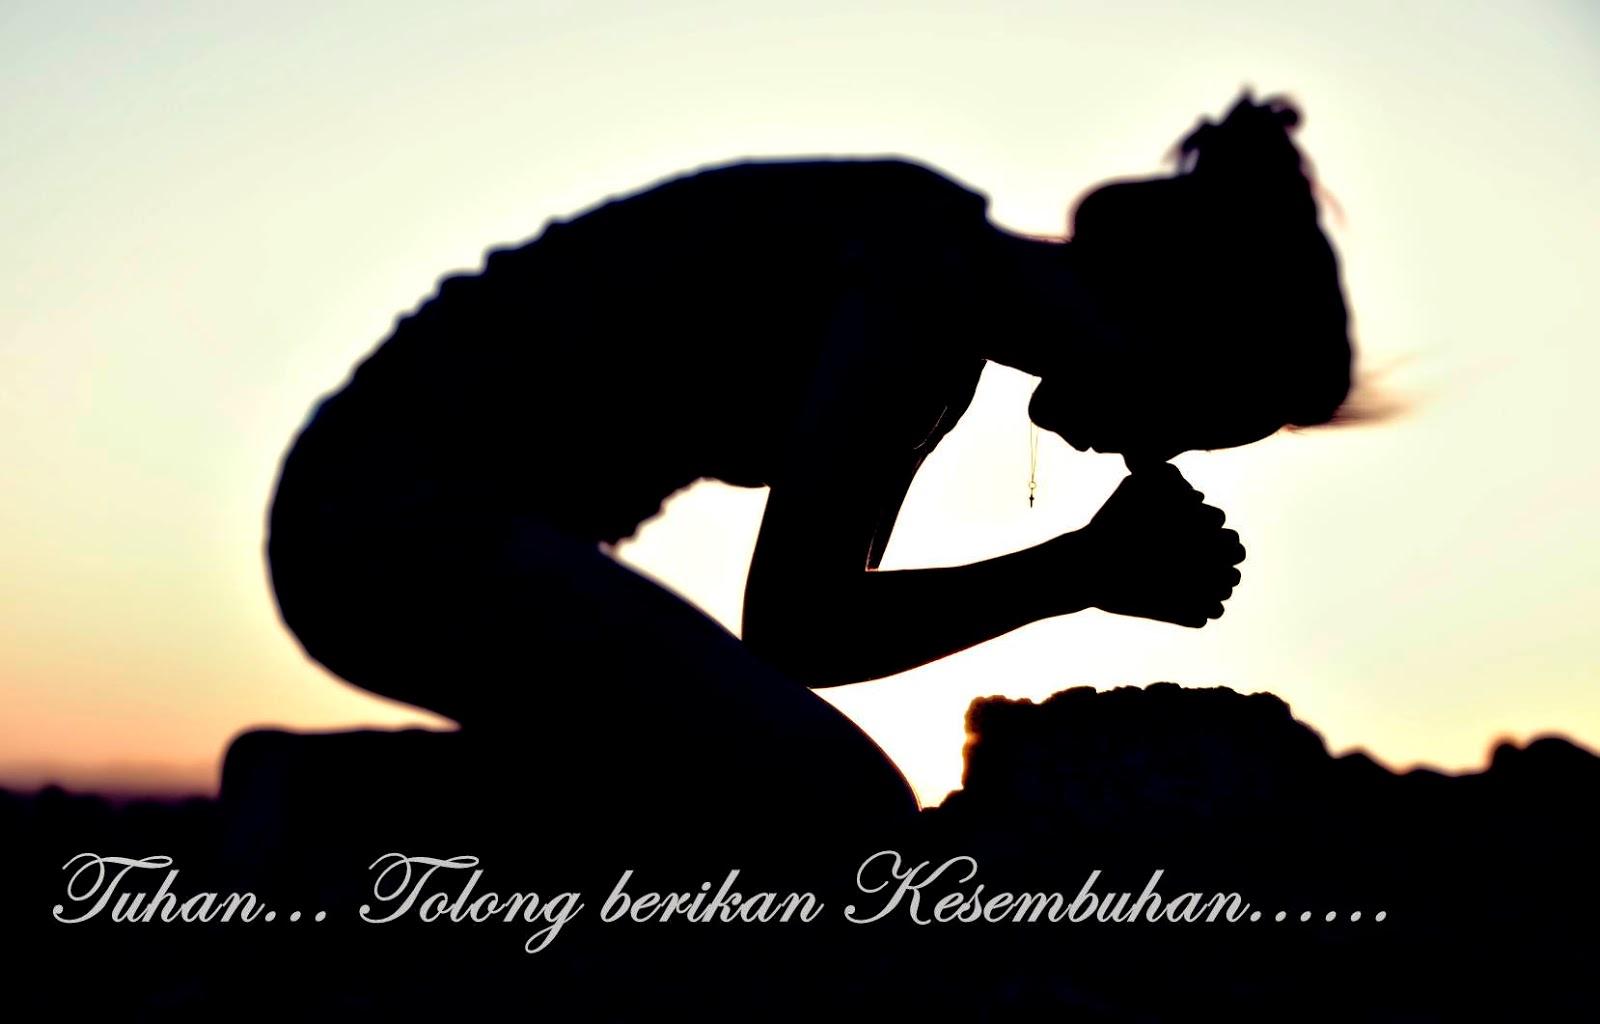 Doa+Untuk+Orang+Sakit+Supaya+Cepat+Sembuh.jpg